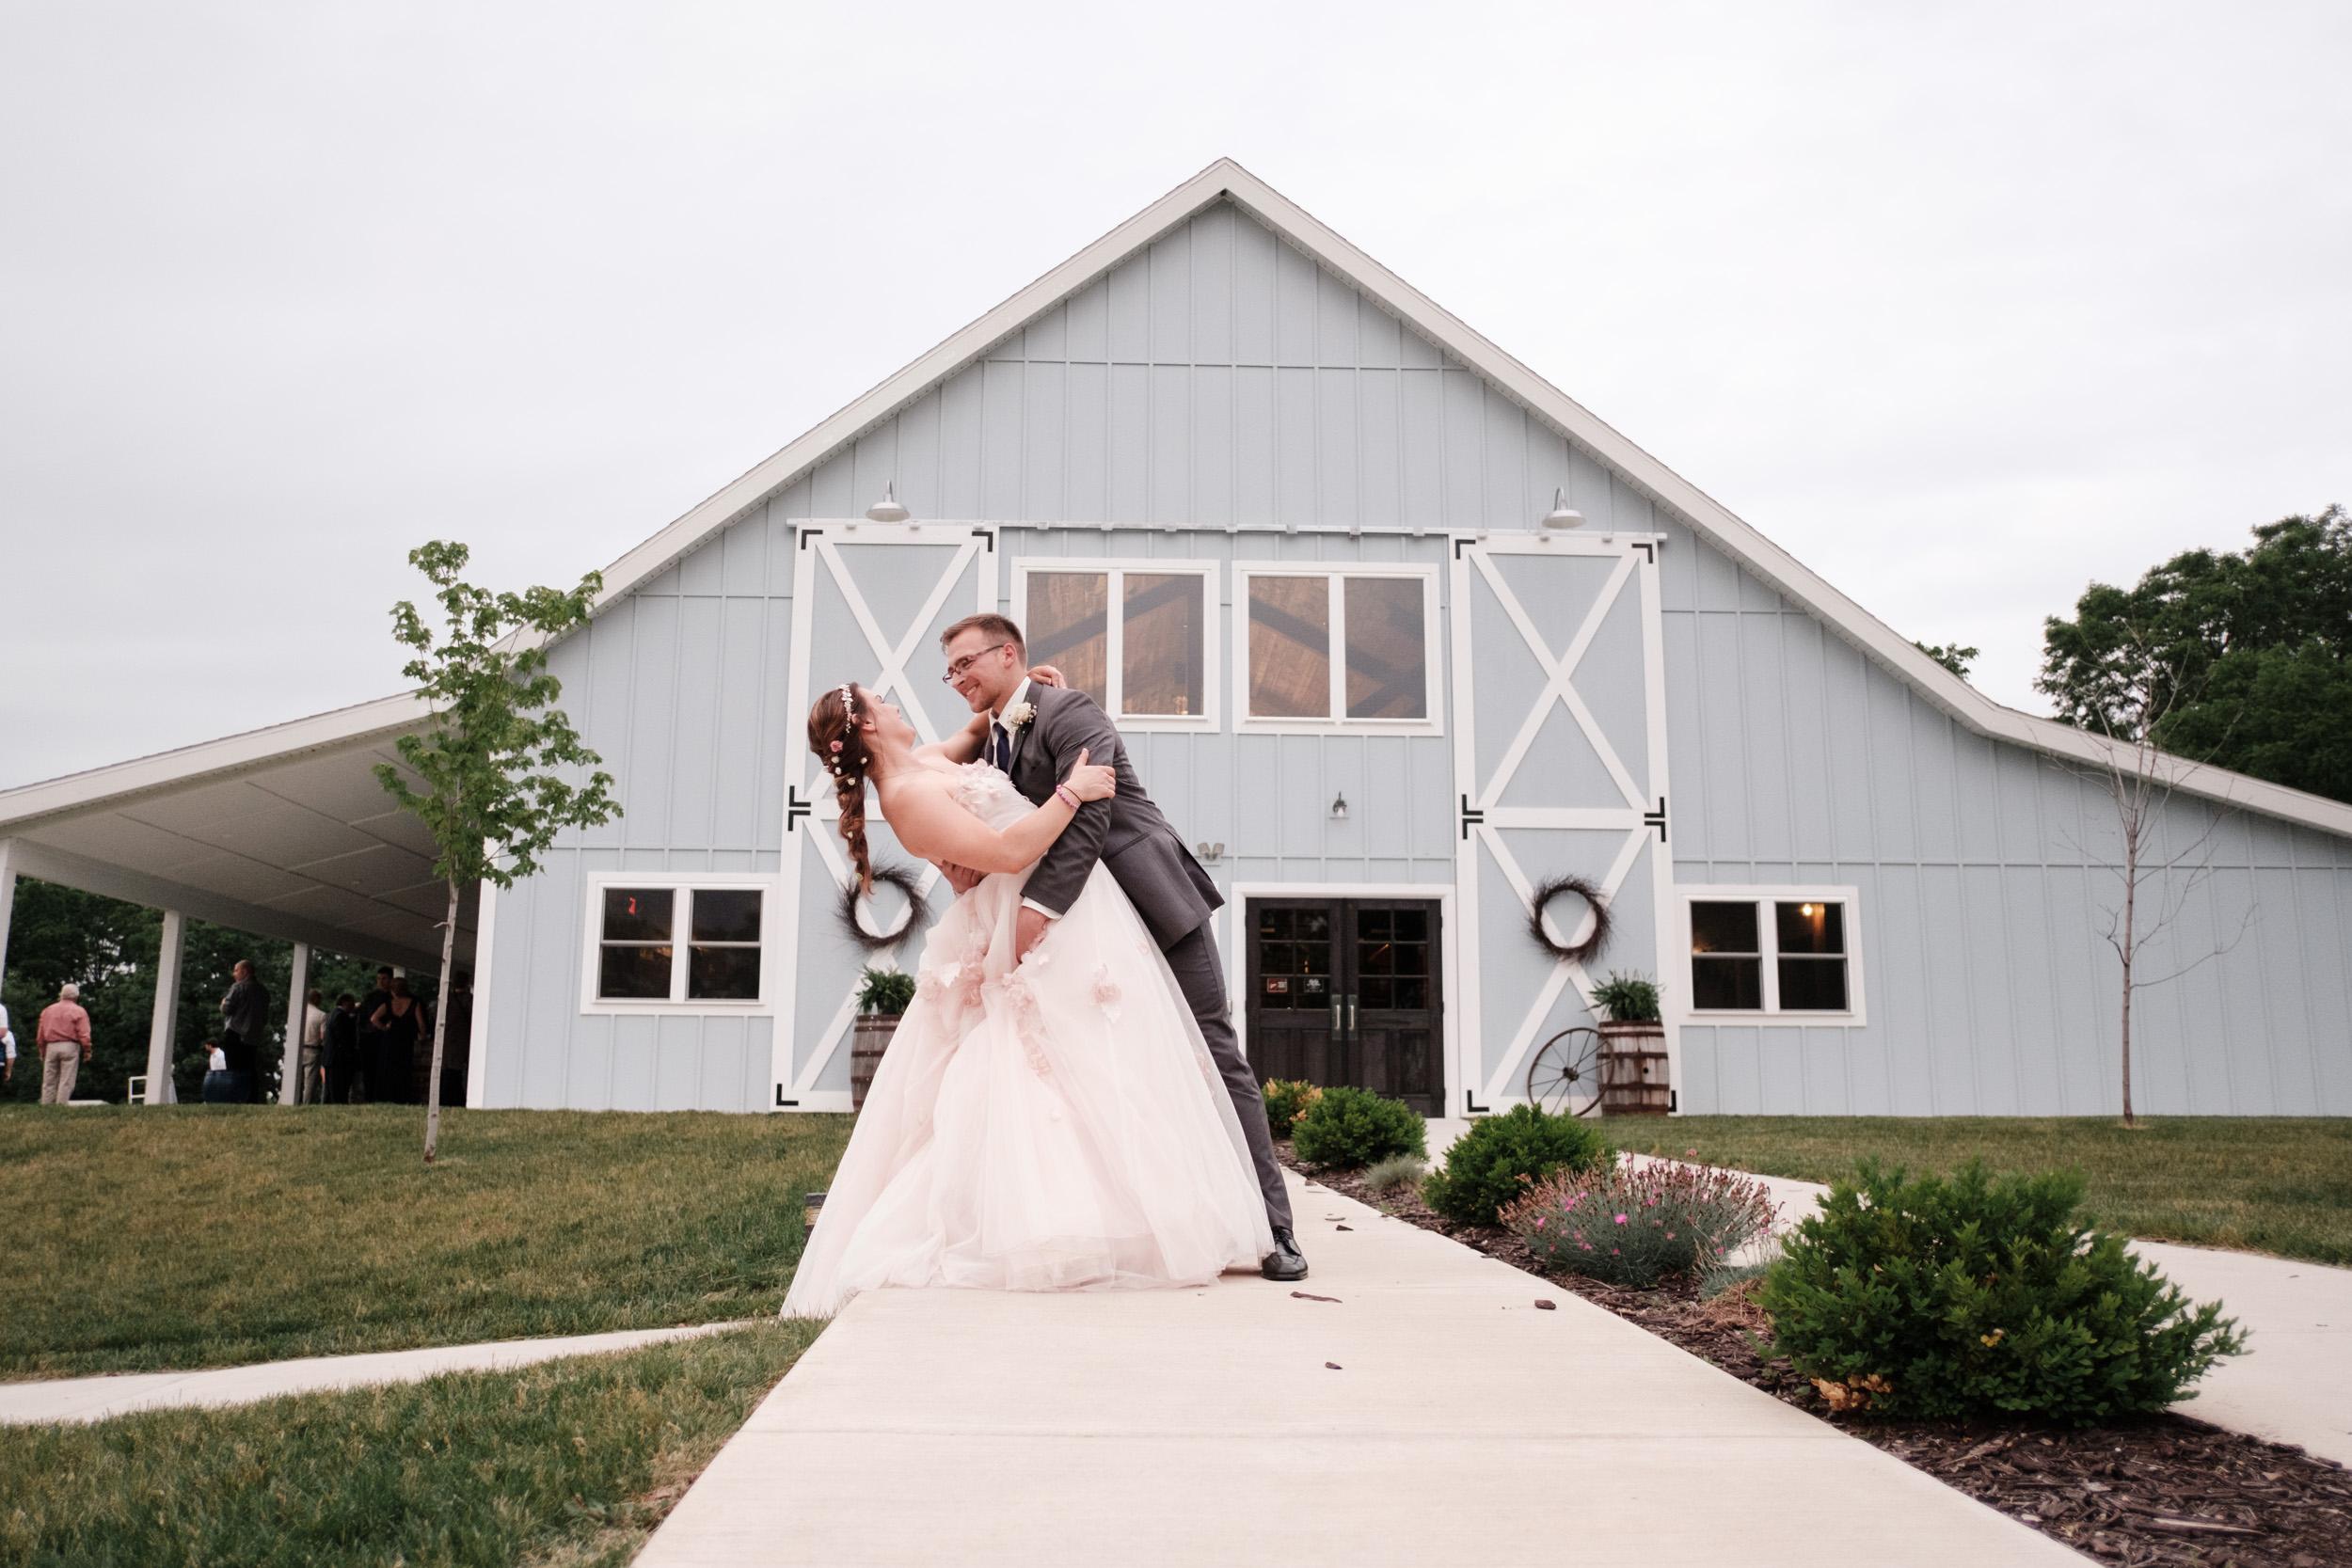 19-06-22-Ryan-Katie-The-Fields-Reserve-Wedding-71.jpg